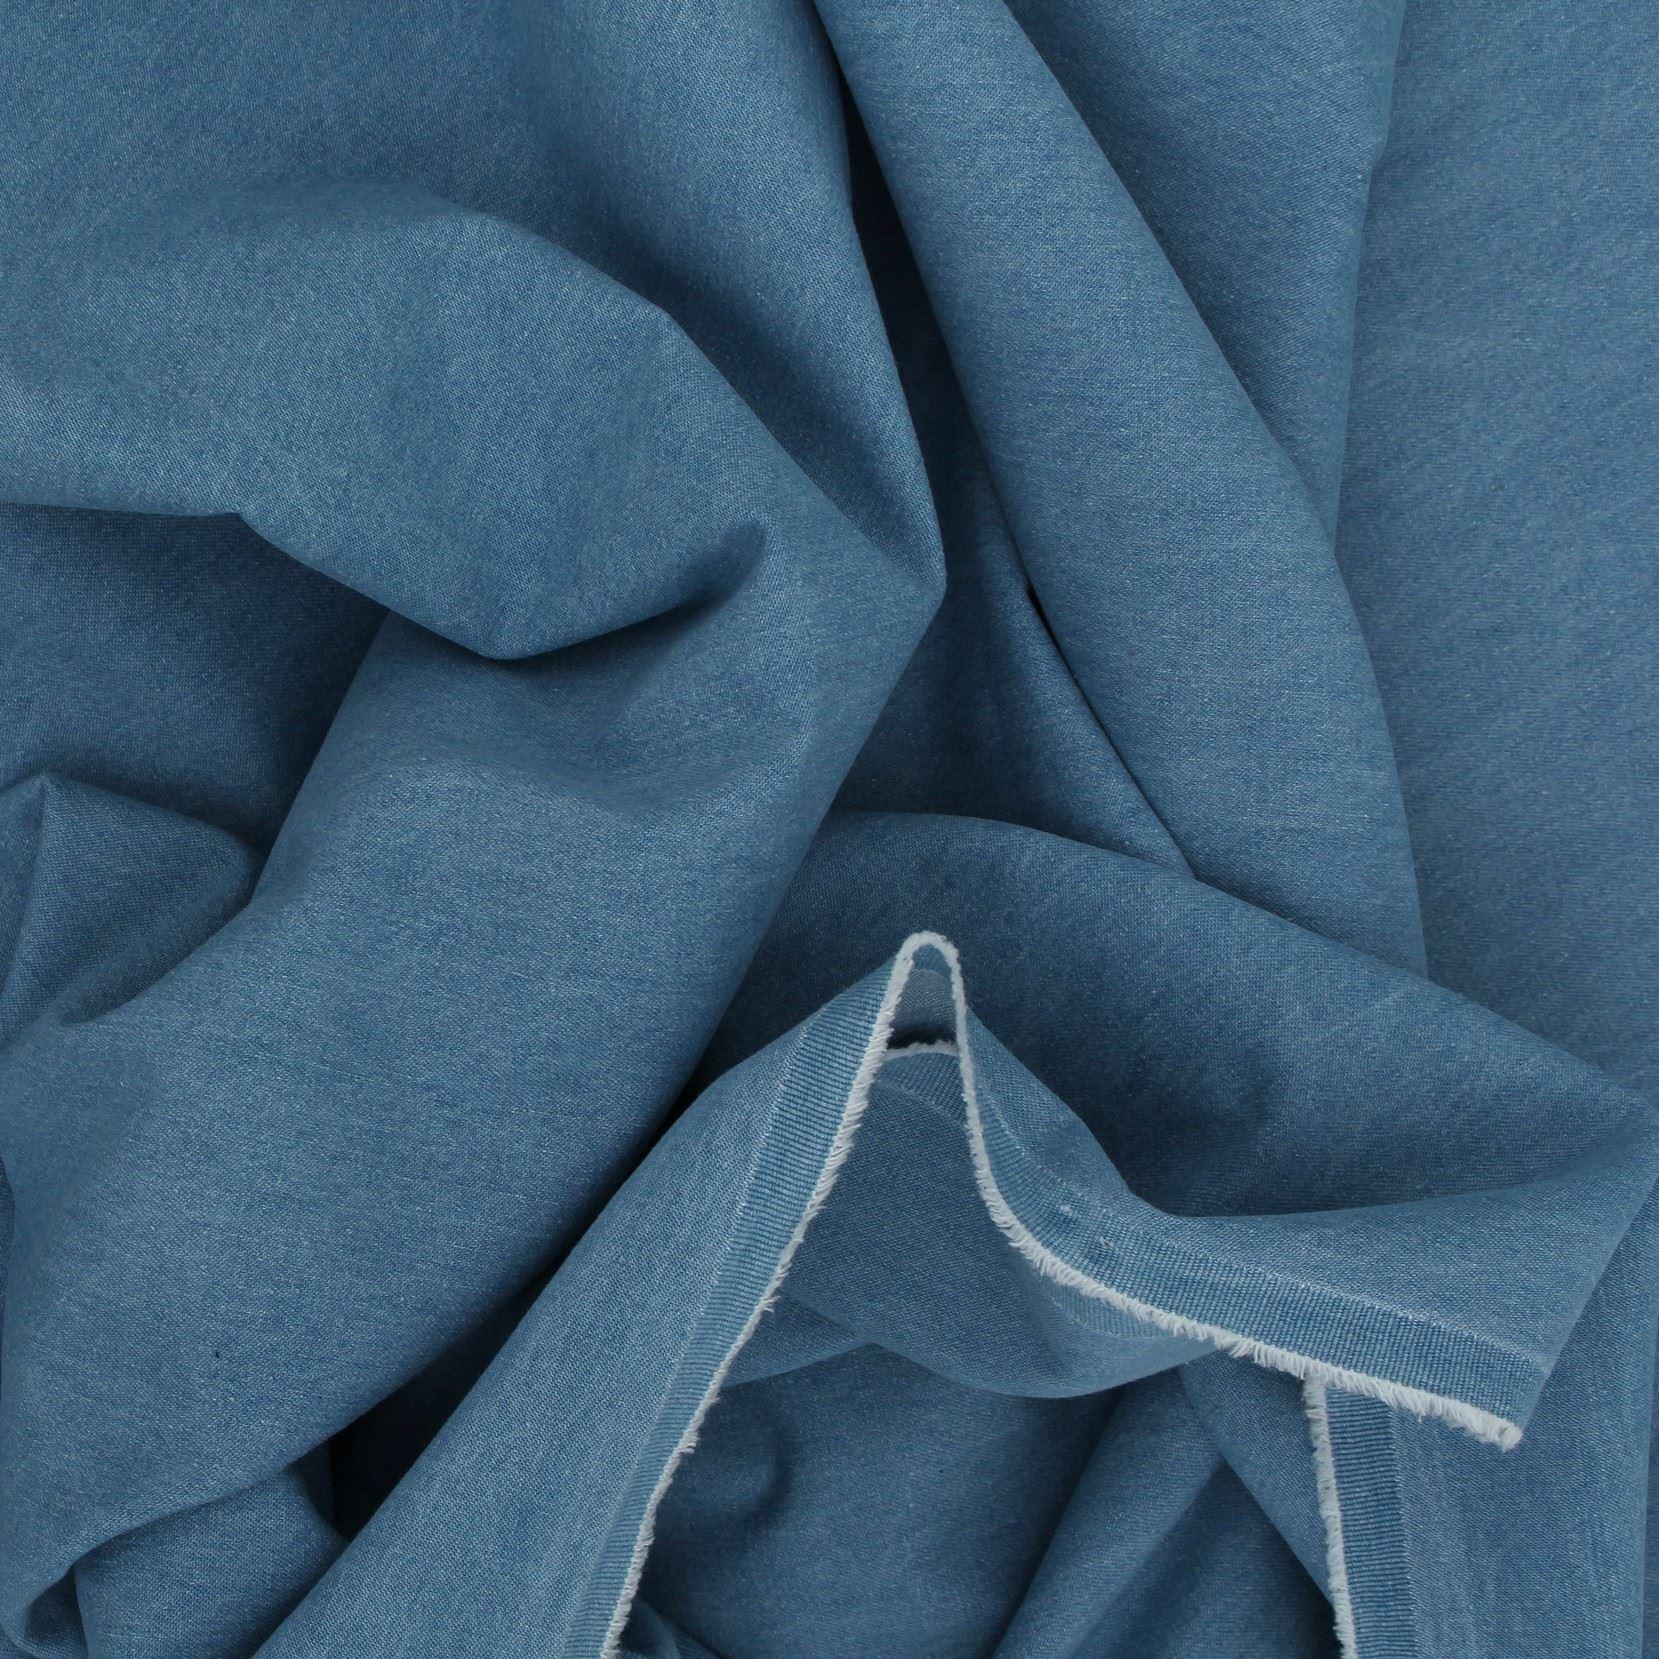 thumbnail 3 - 100% COTTON HEAVYWEIGHT WASHED DENIM CRAFT CLOTHING DRESS SEWING FABRIC